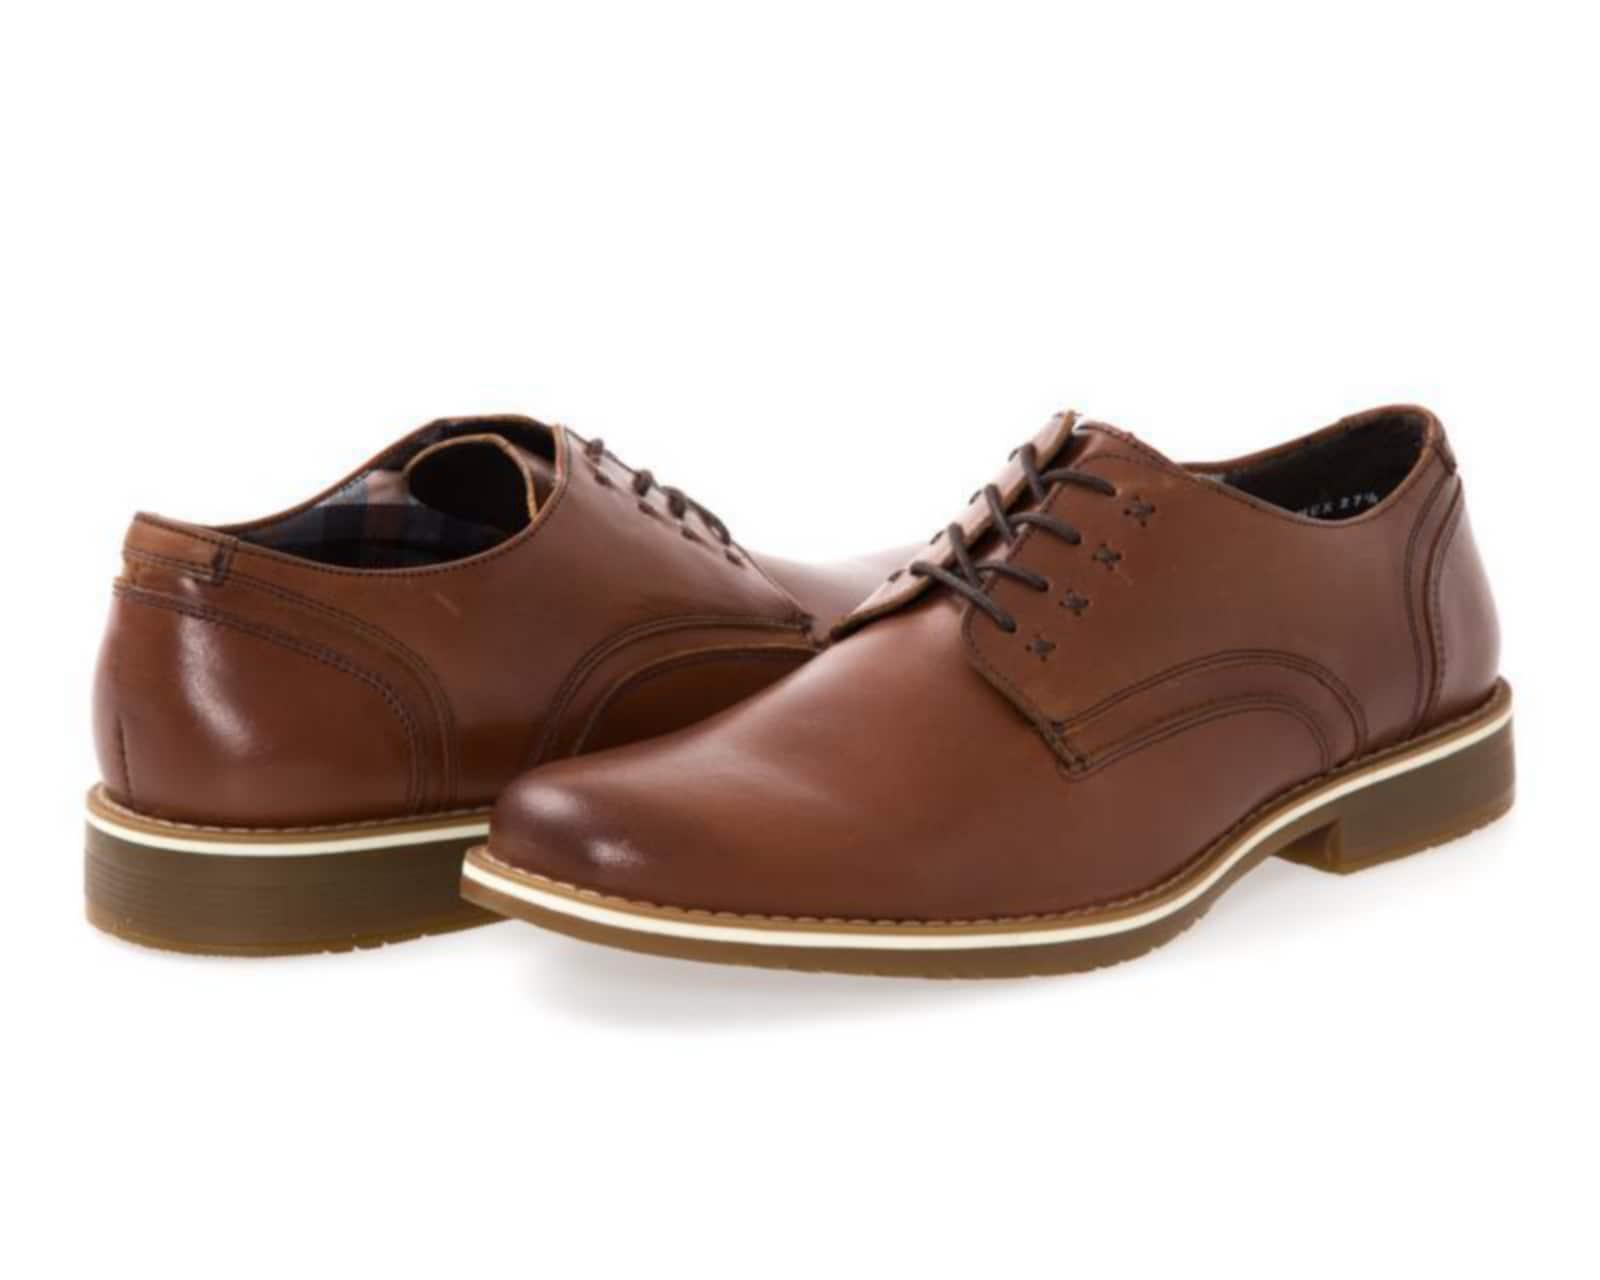 fdb8fc0daf Zapatos Flexi Piel color Café para Hombre 8071582